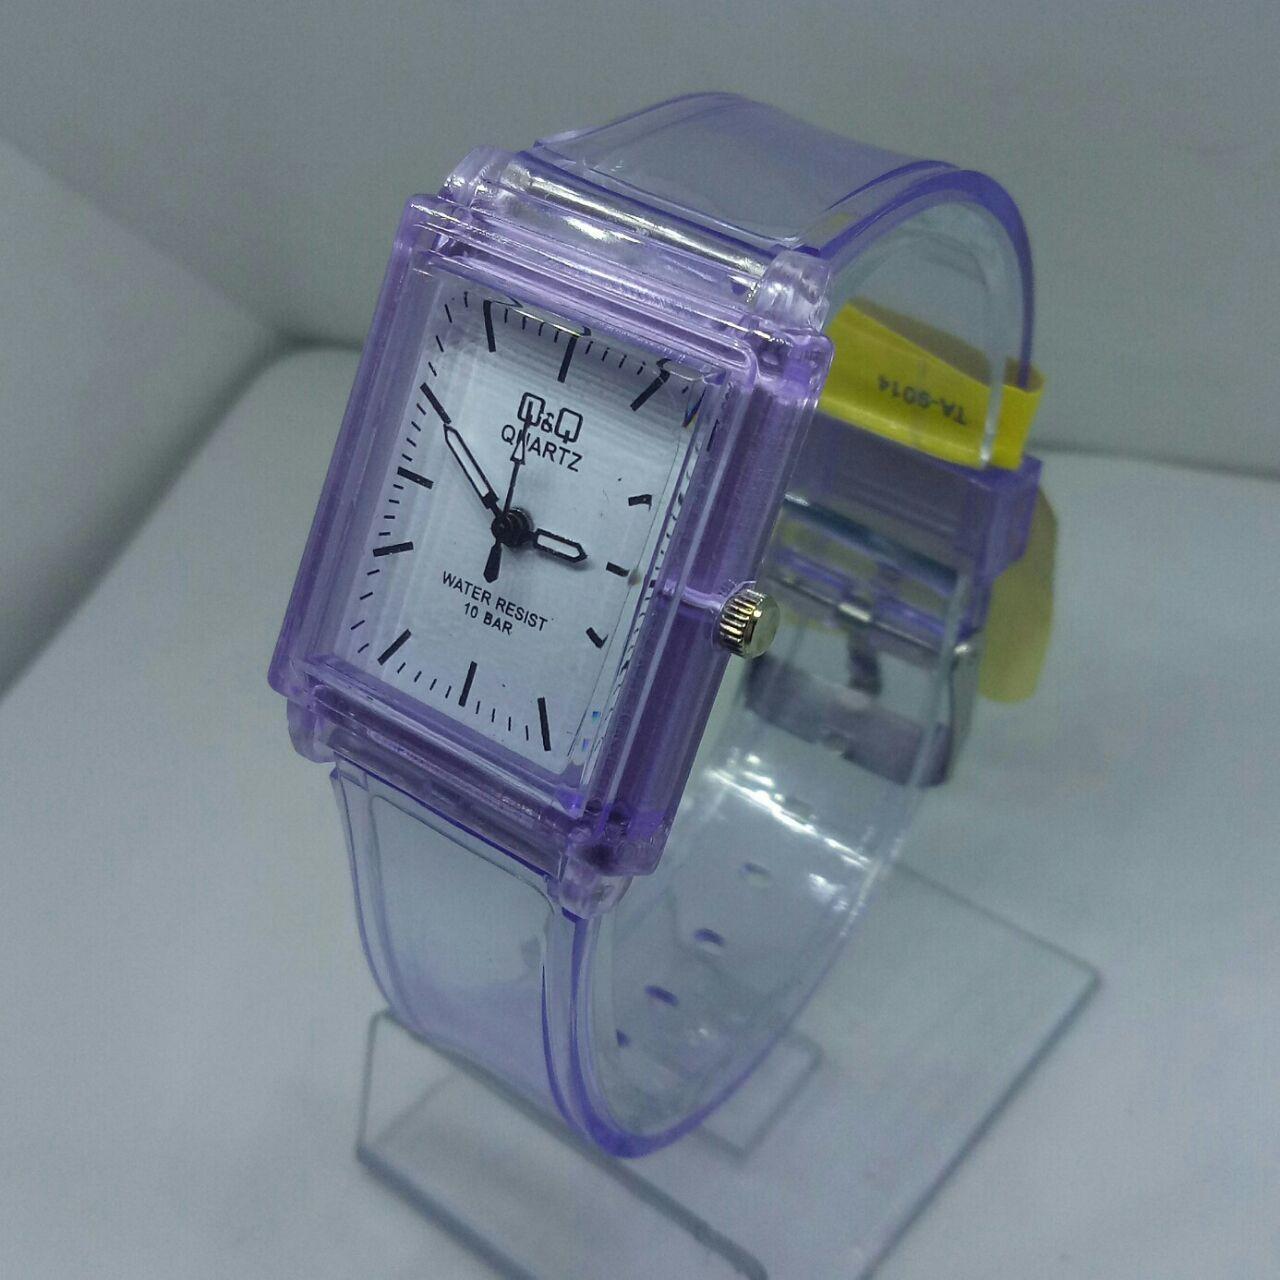 QnQ QQ Q&Q Original - jam tangan wanita sporty model terbaru kotak - tali karet transparan